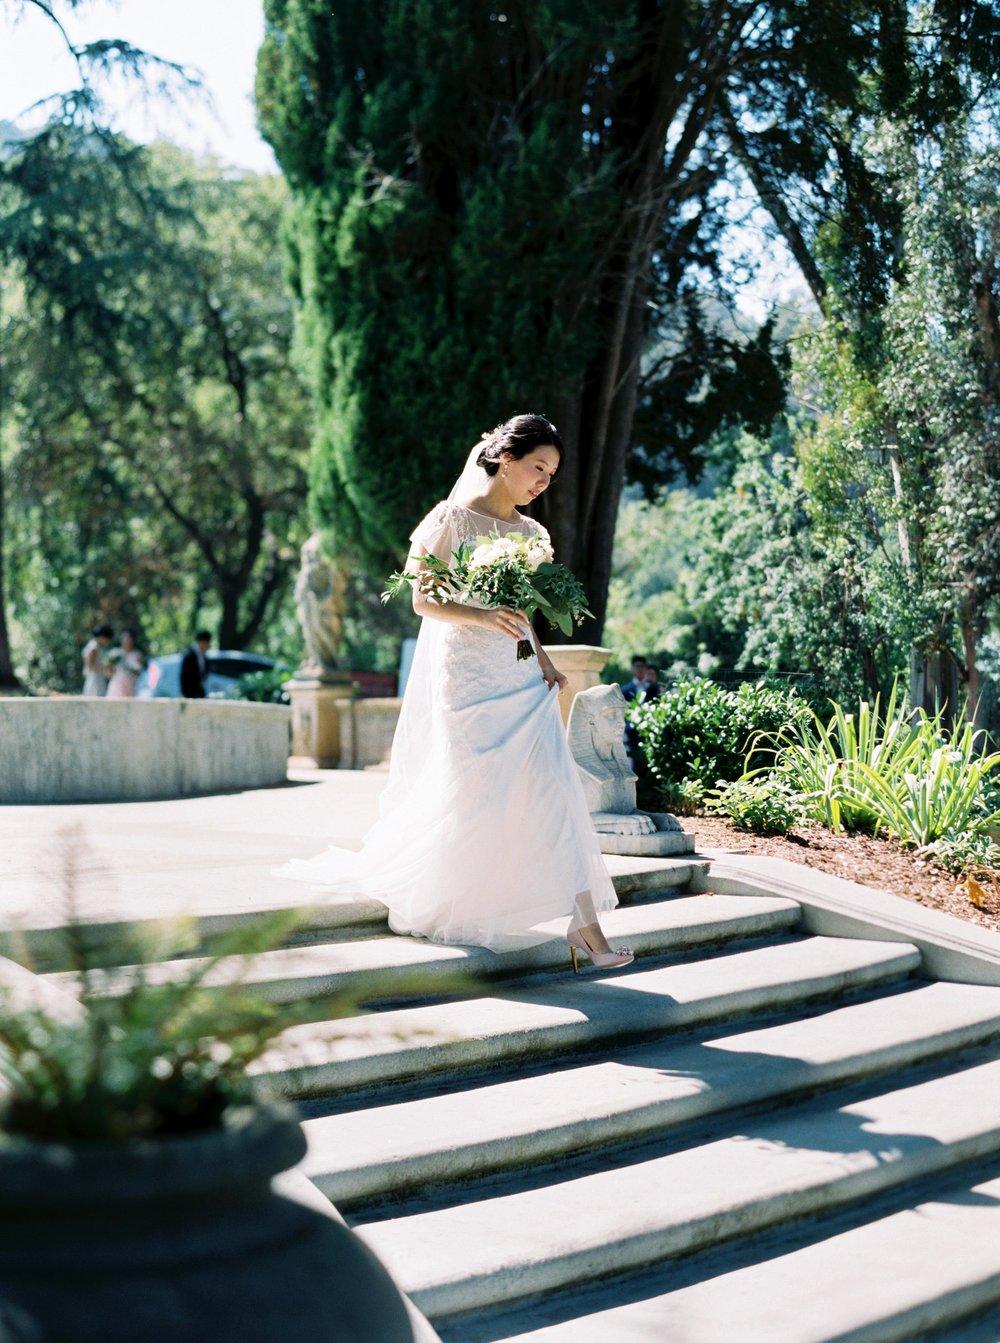 Villa_Montalvo_Wedding_Photographer_Videographer_San_Francisco064.jpg